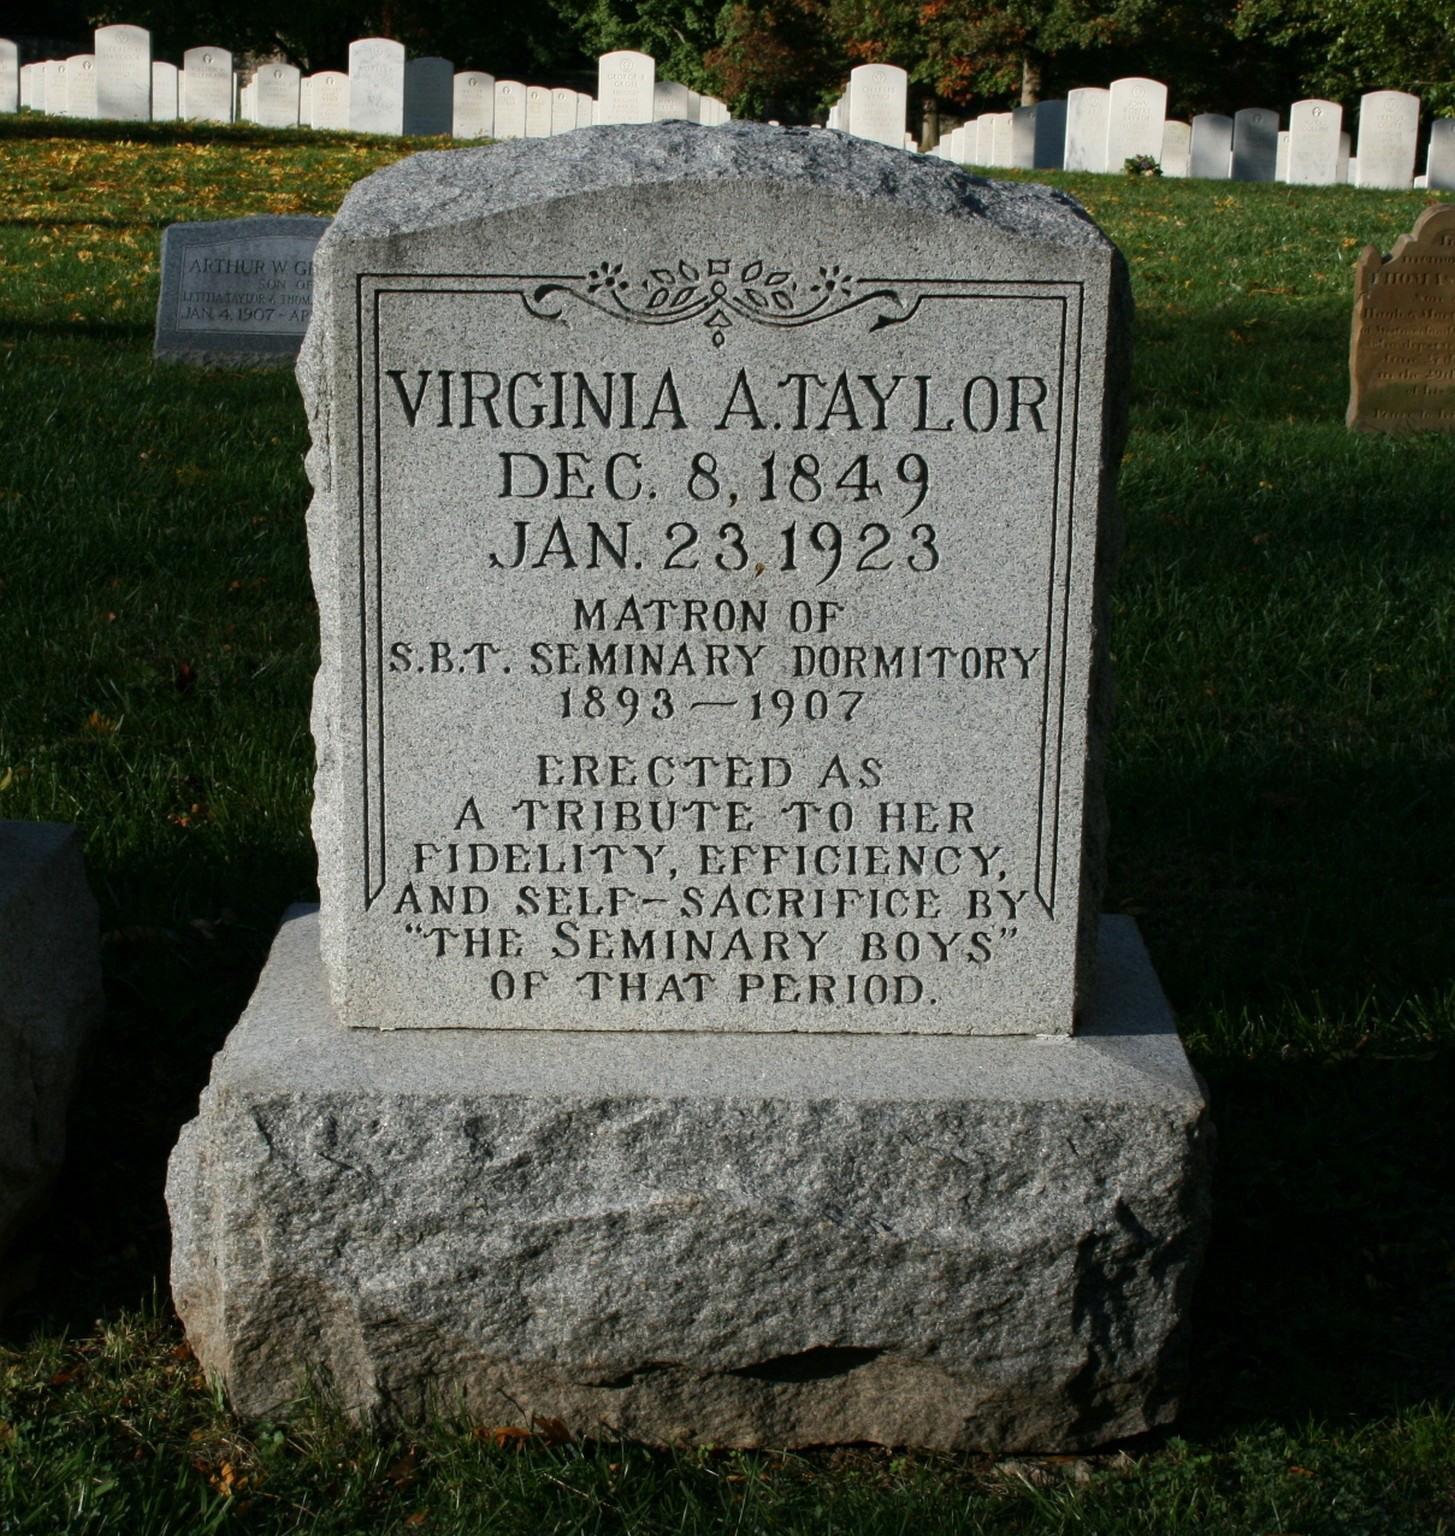 Virginia A Taylor